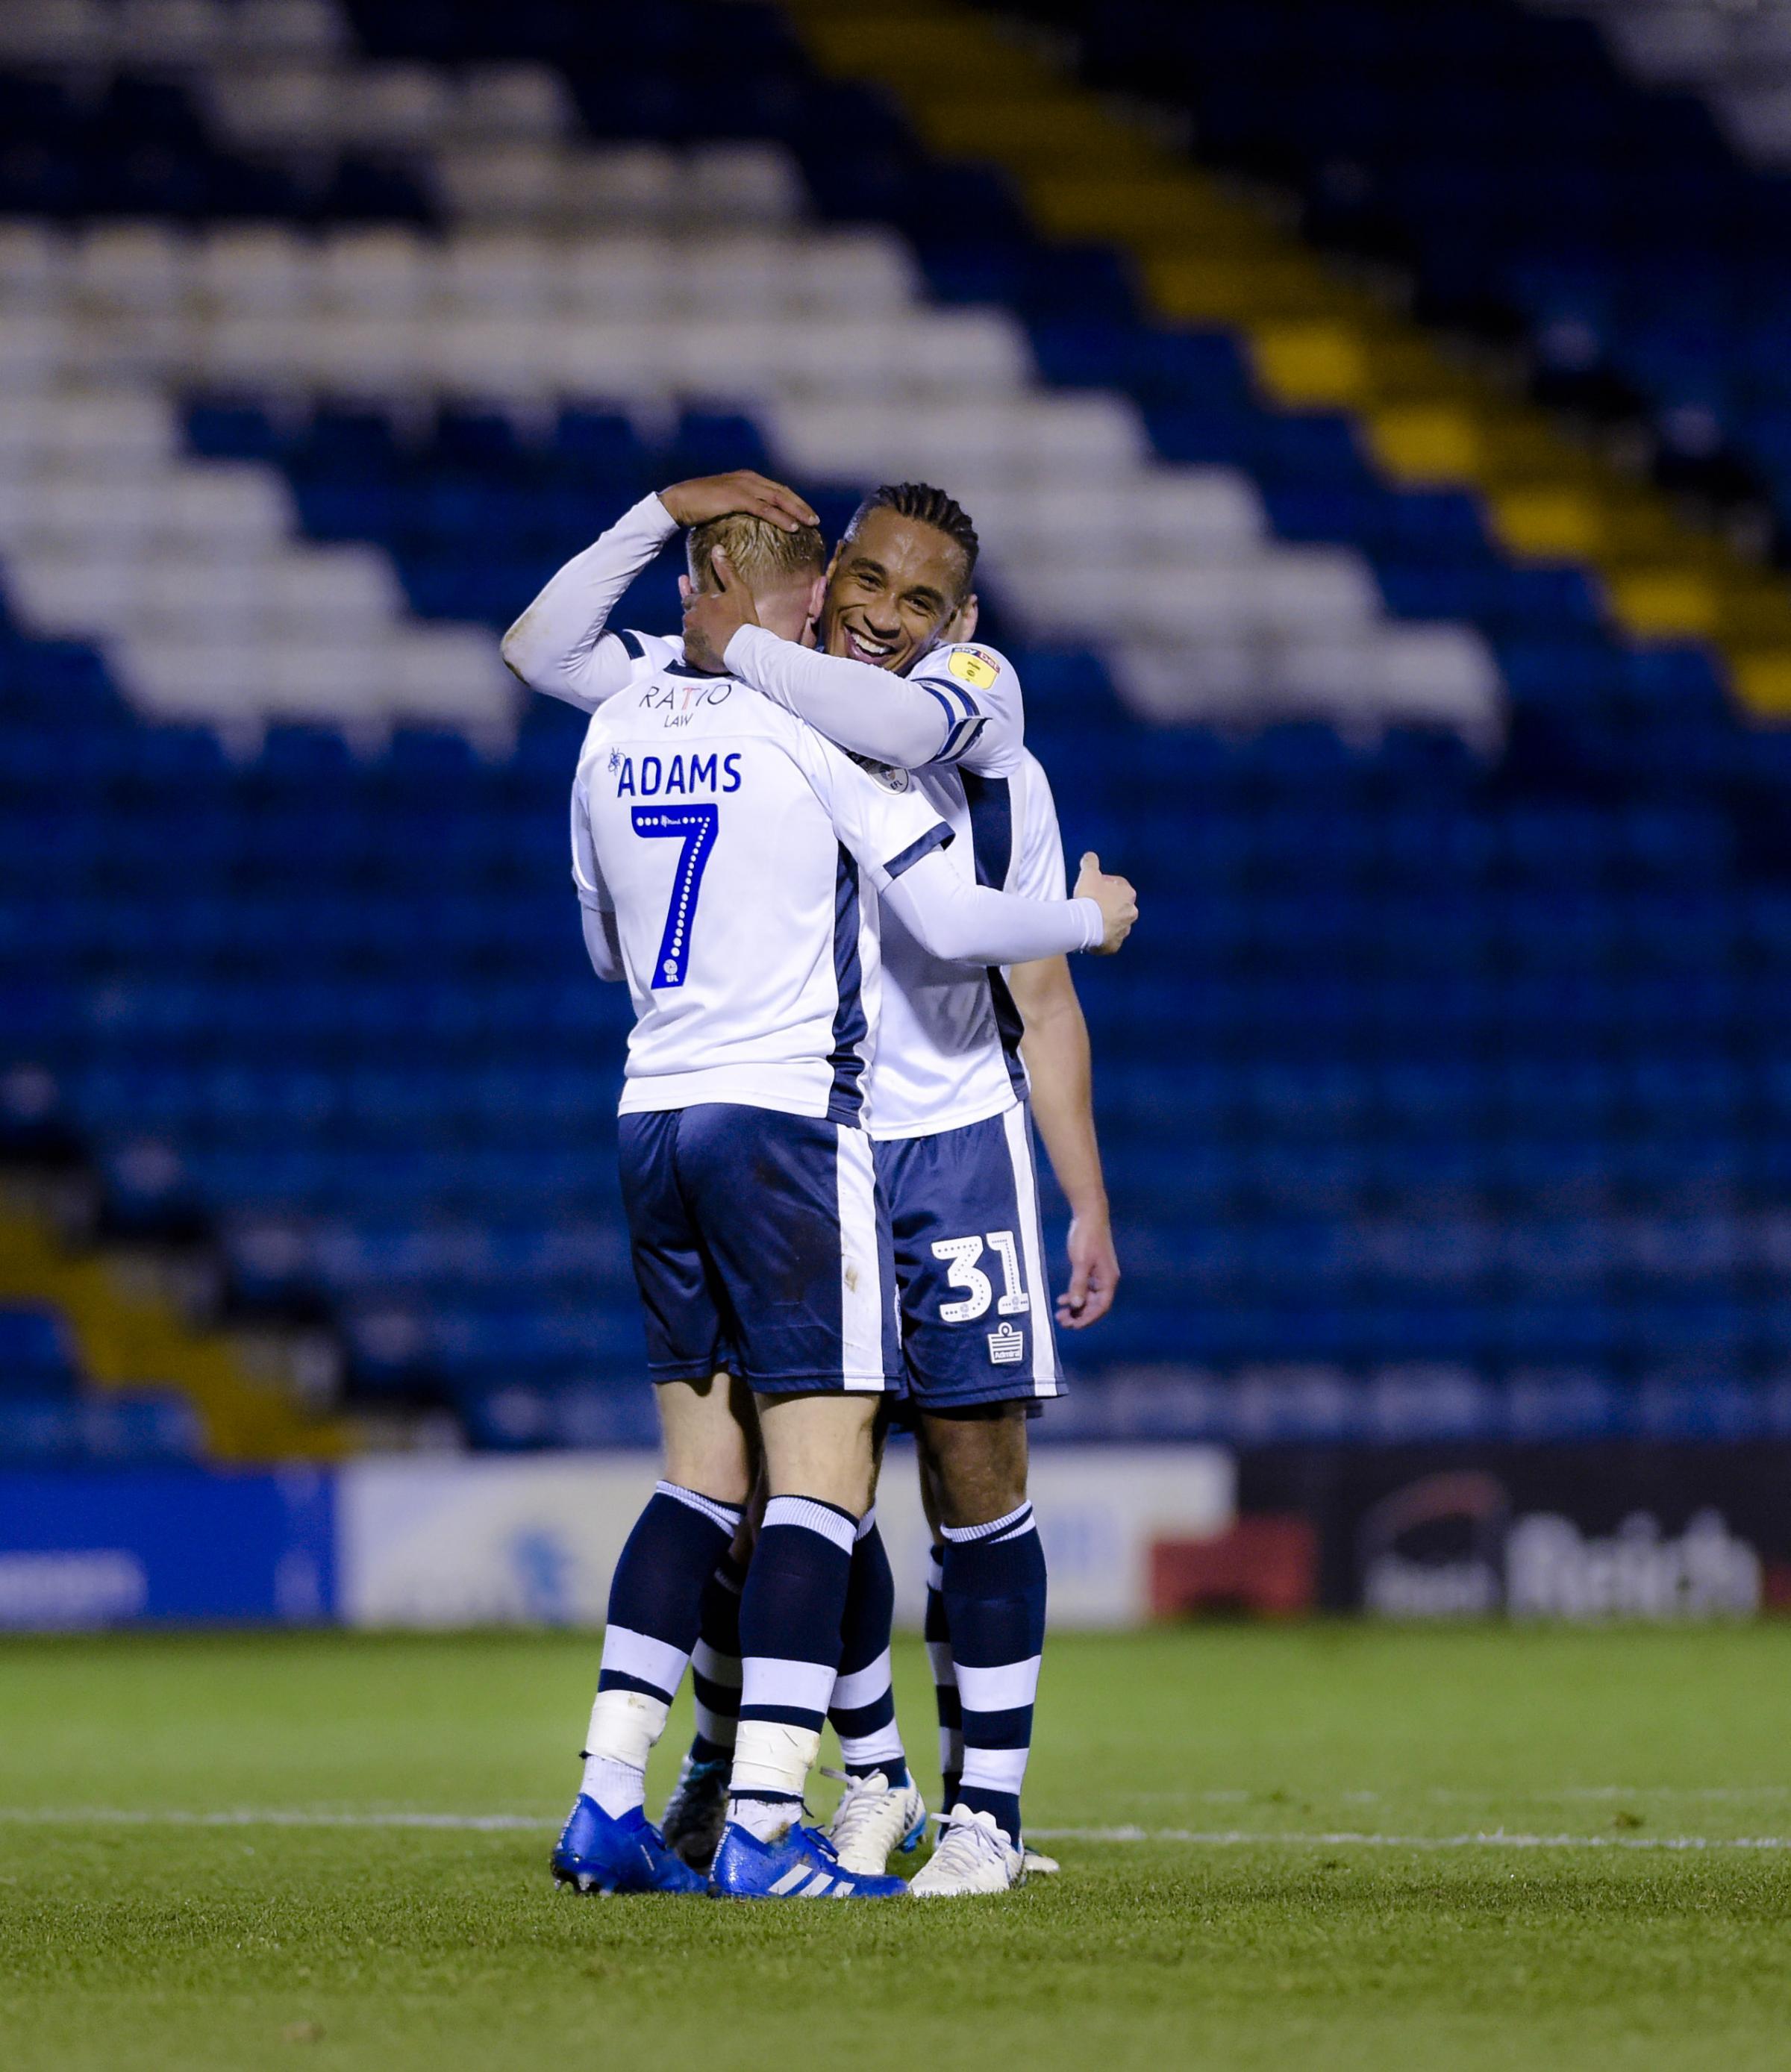 PICTURES: Bury FC score three to beat Fleetwood